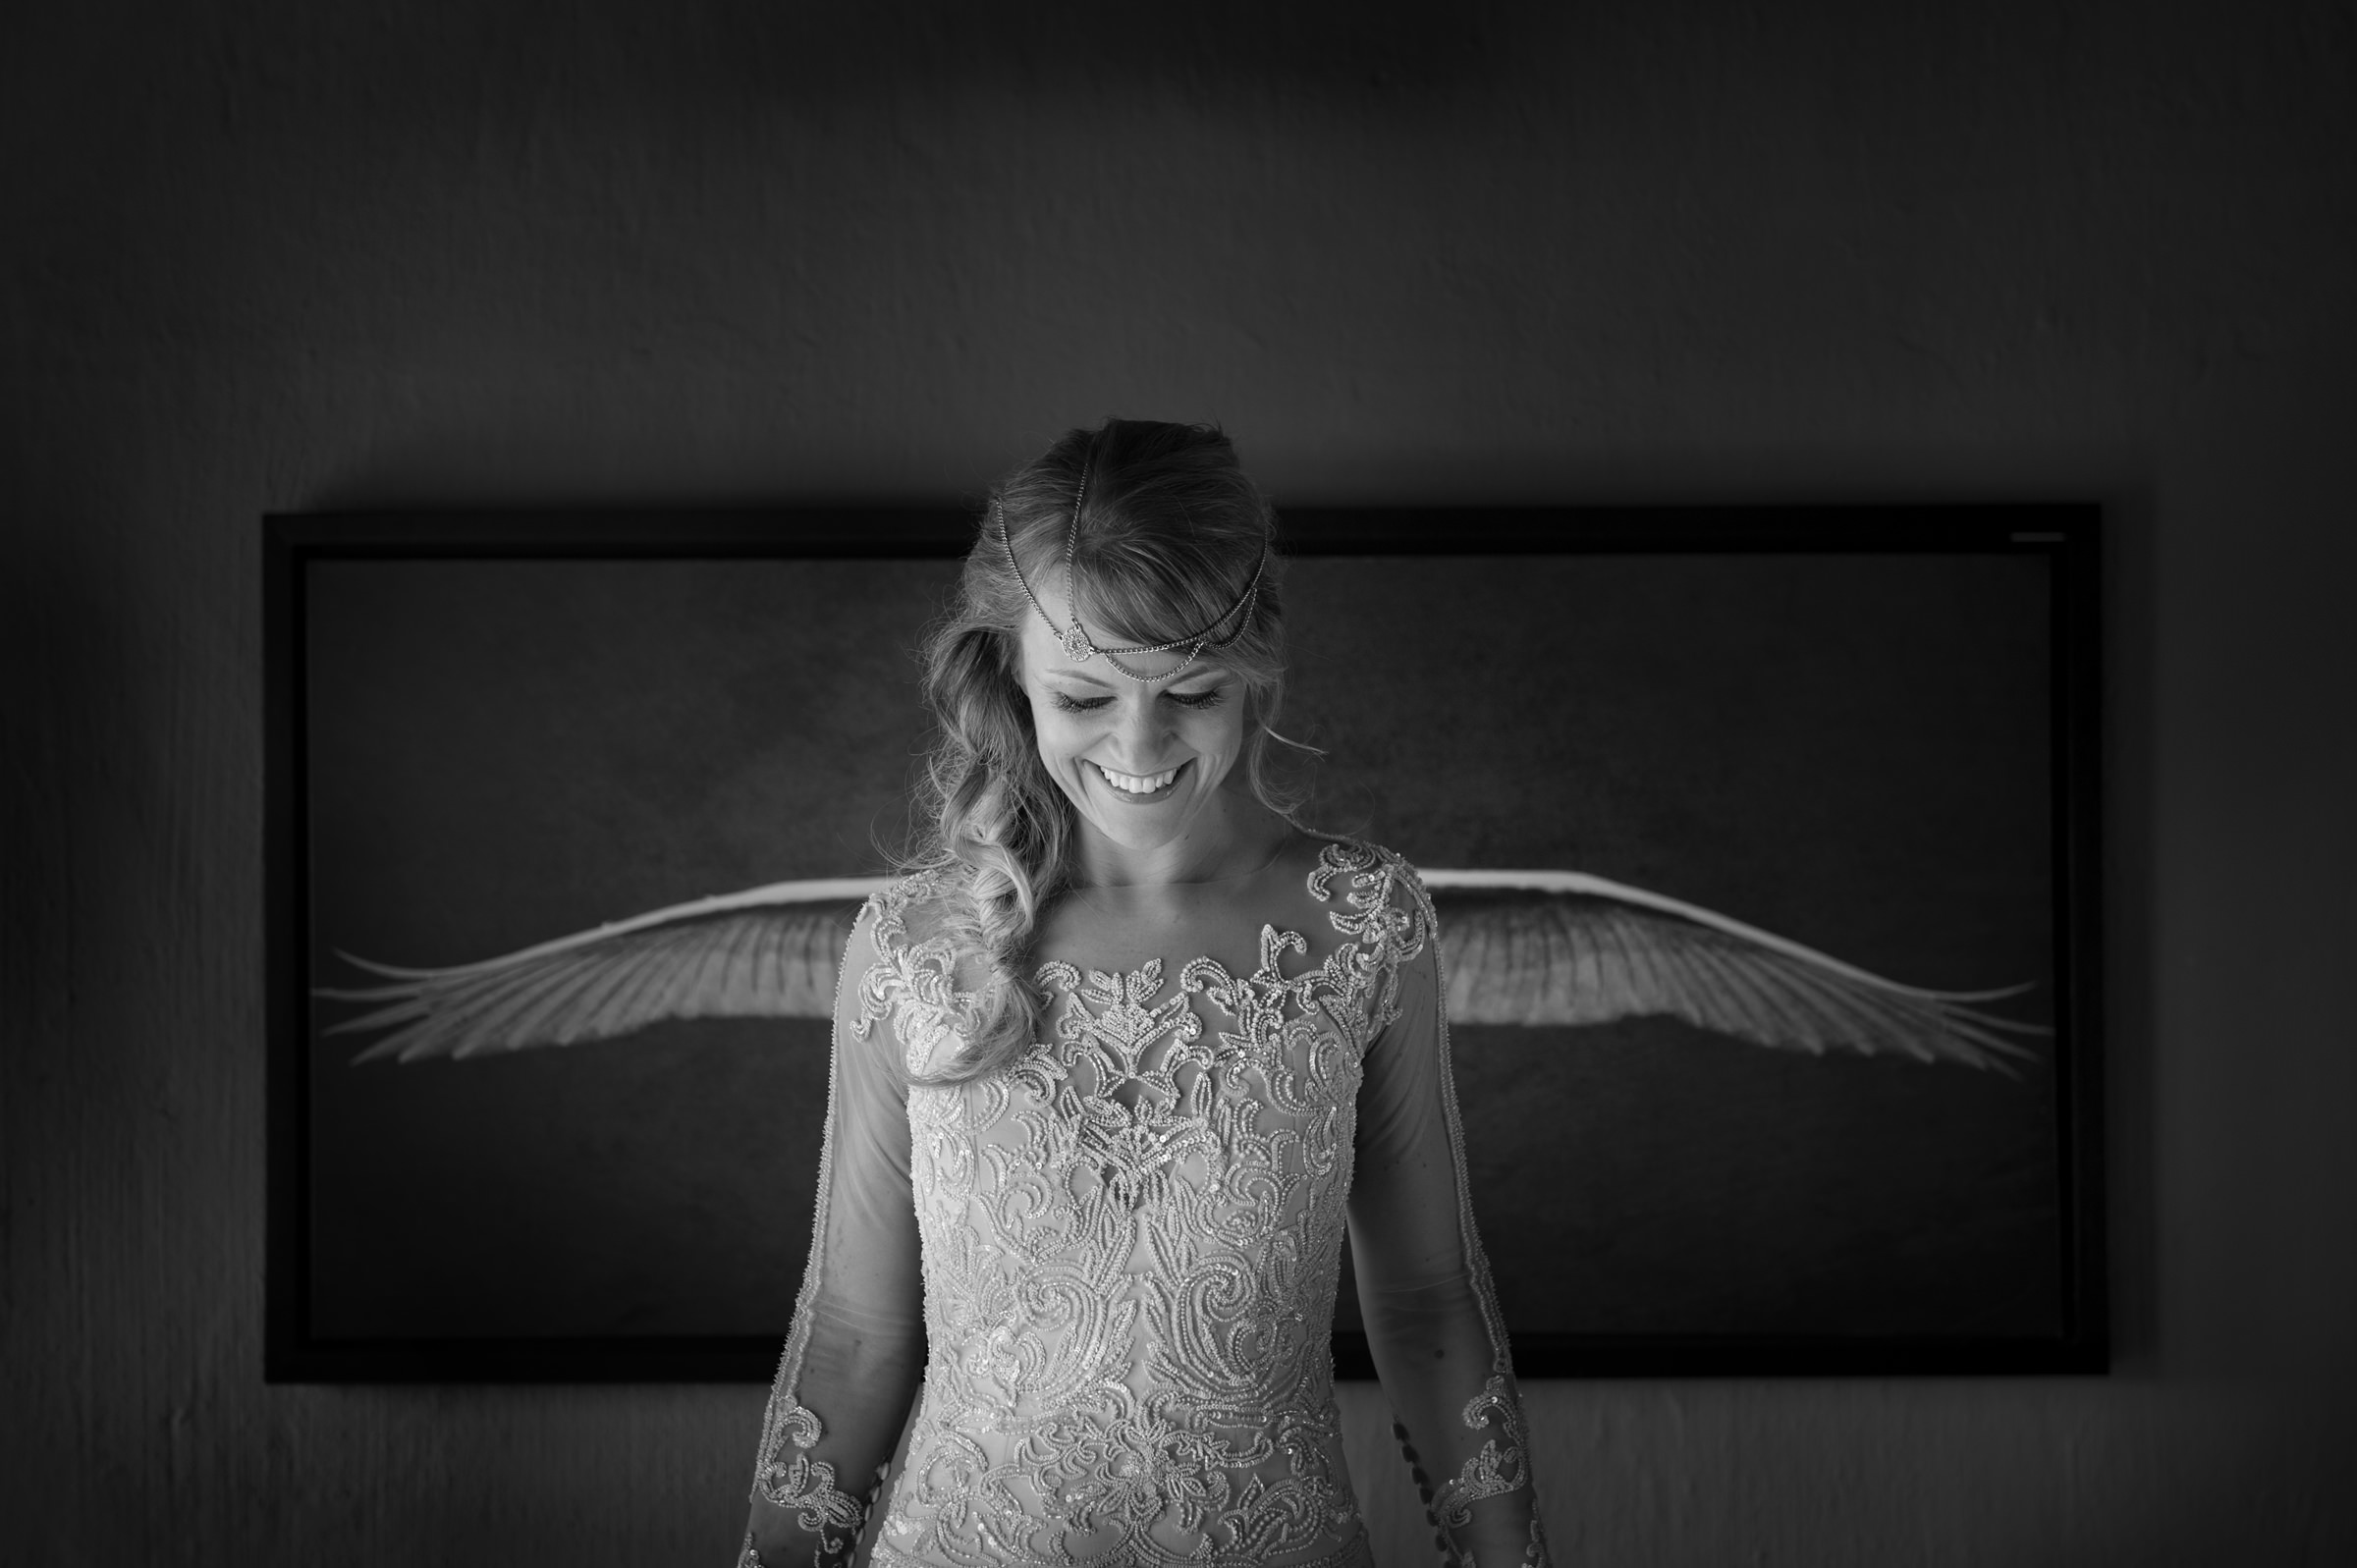 Bride in applique lace dress looks like she's wearing wings- photo by Jacki Bruniquel